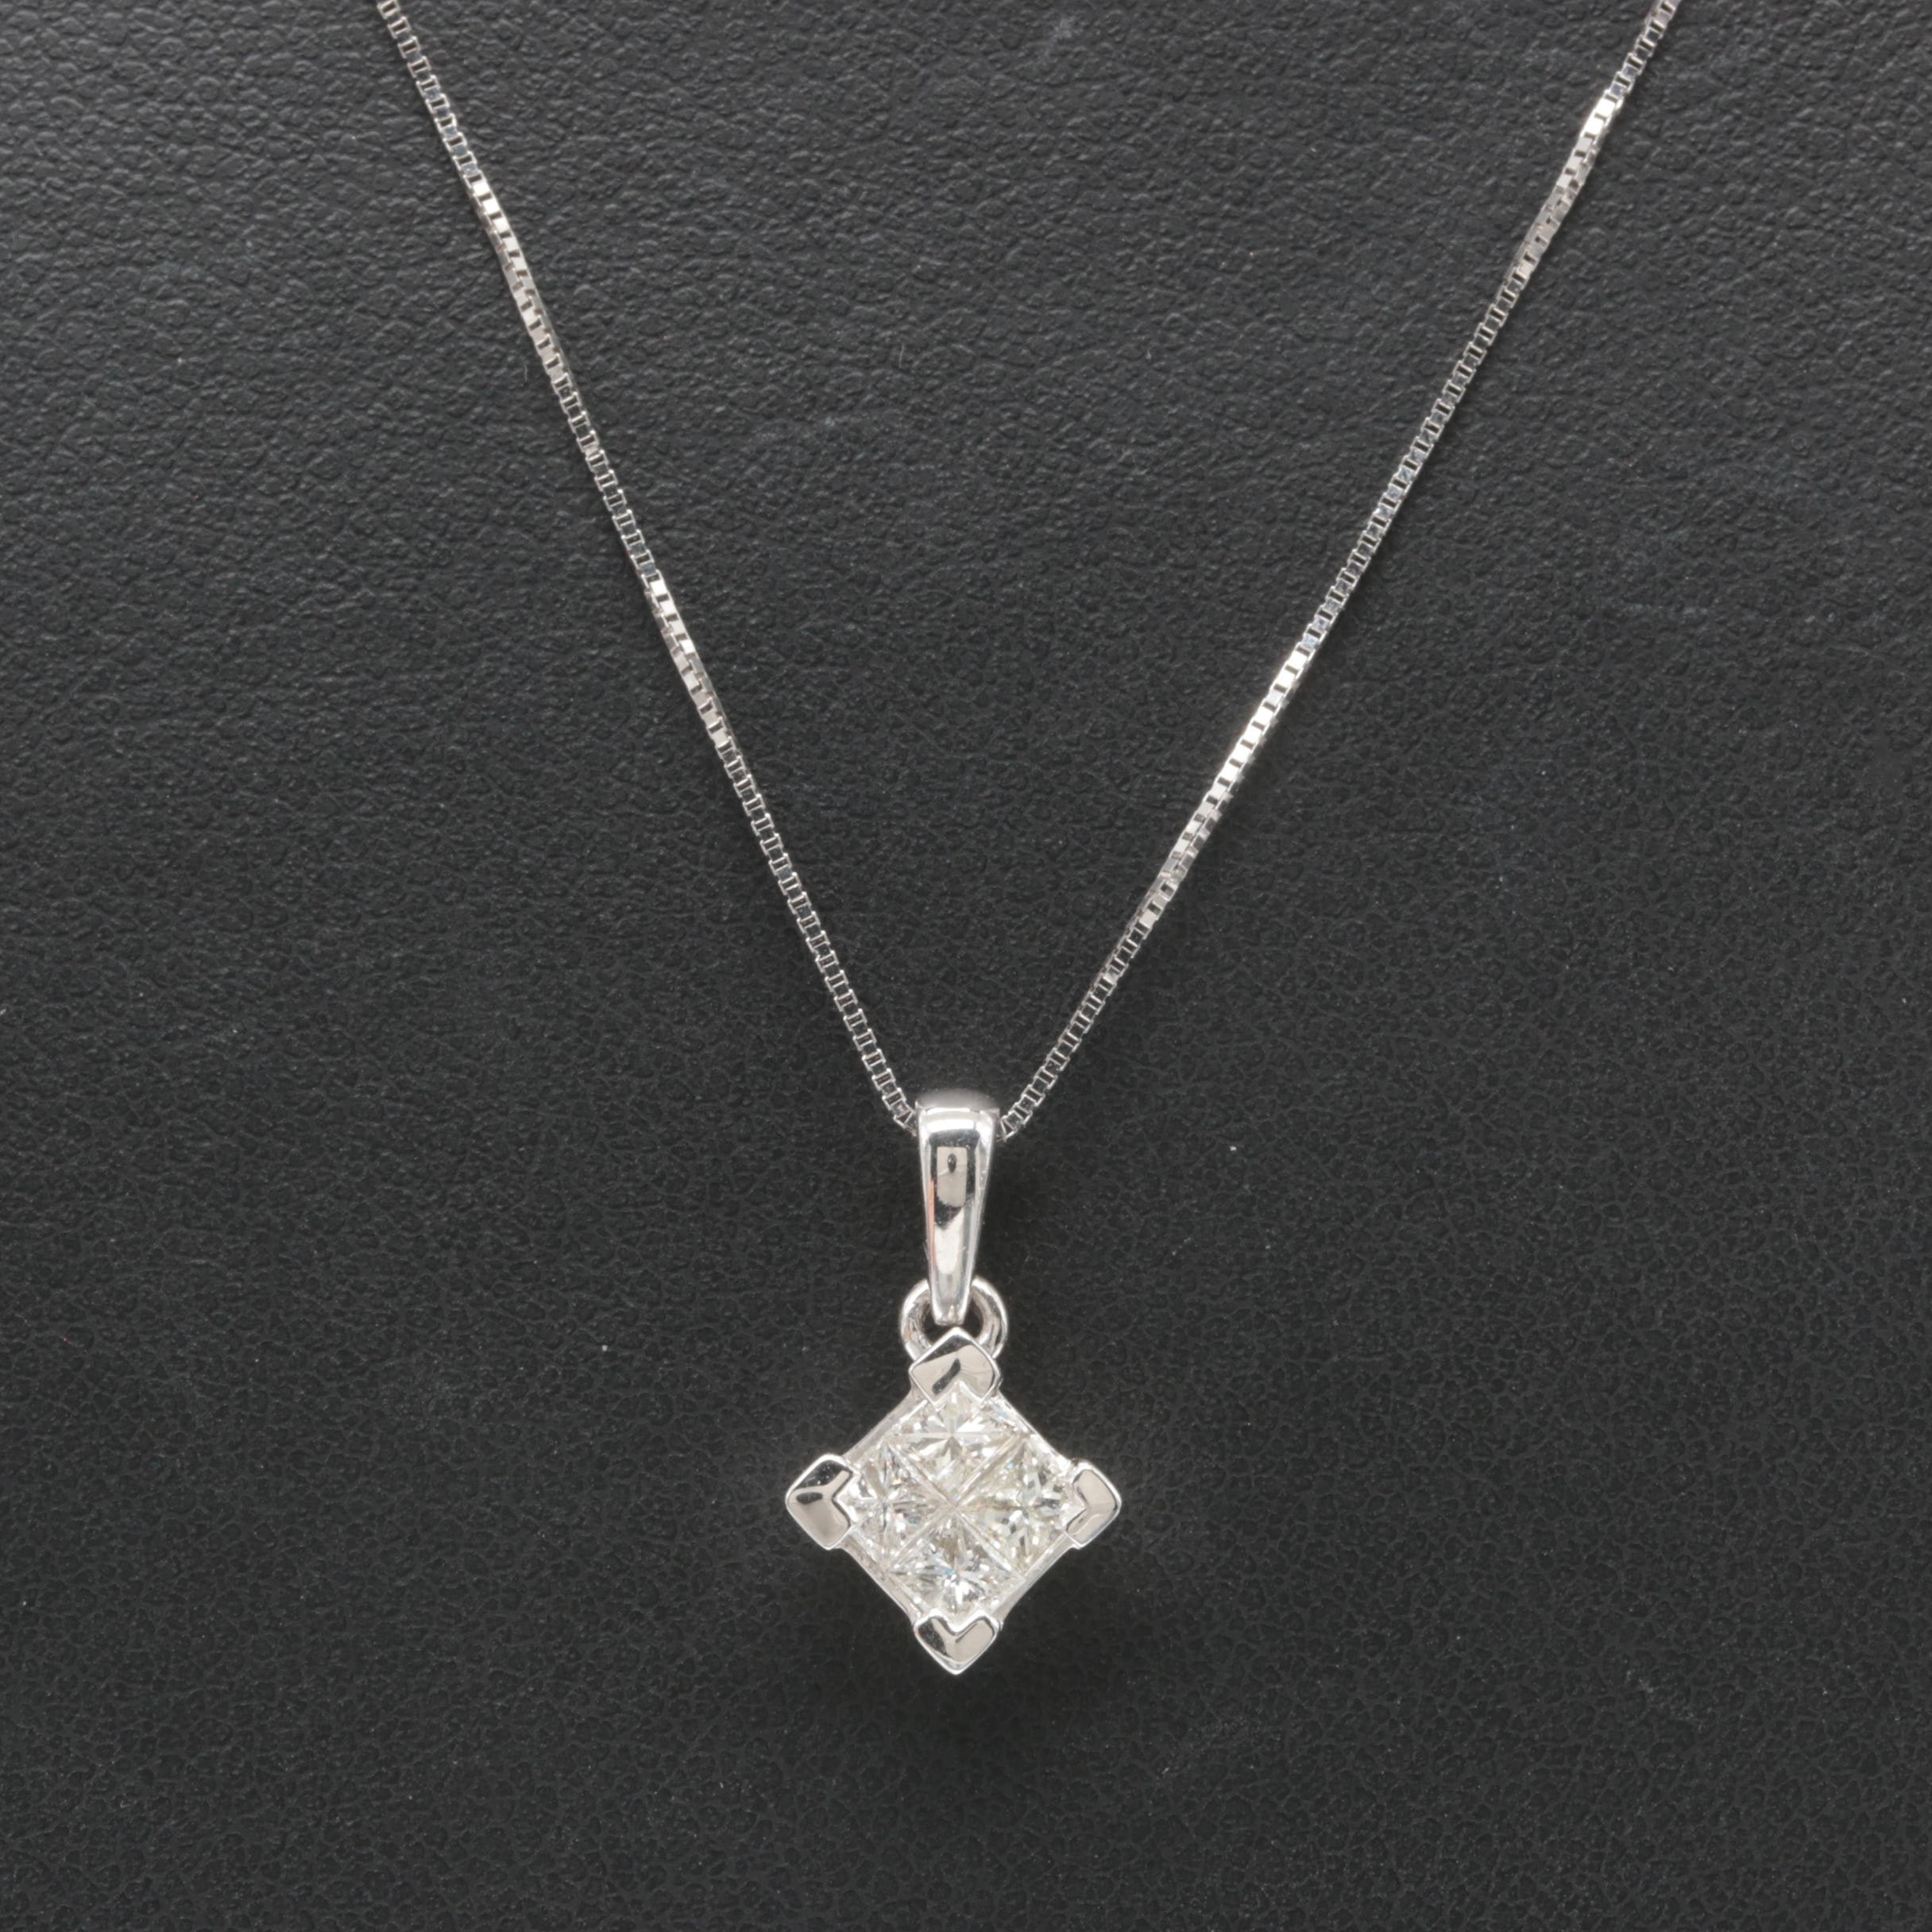 14K White Gold Diamond Pendant Necklace Including Aurafin